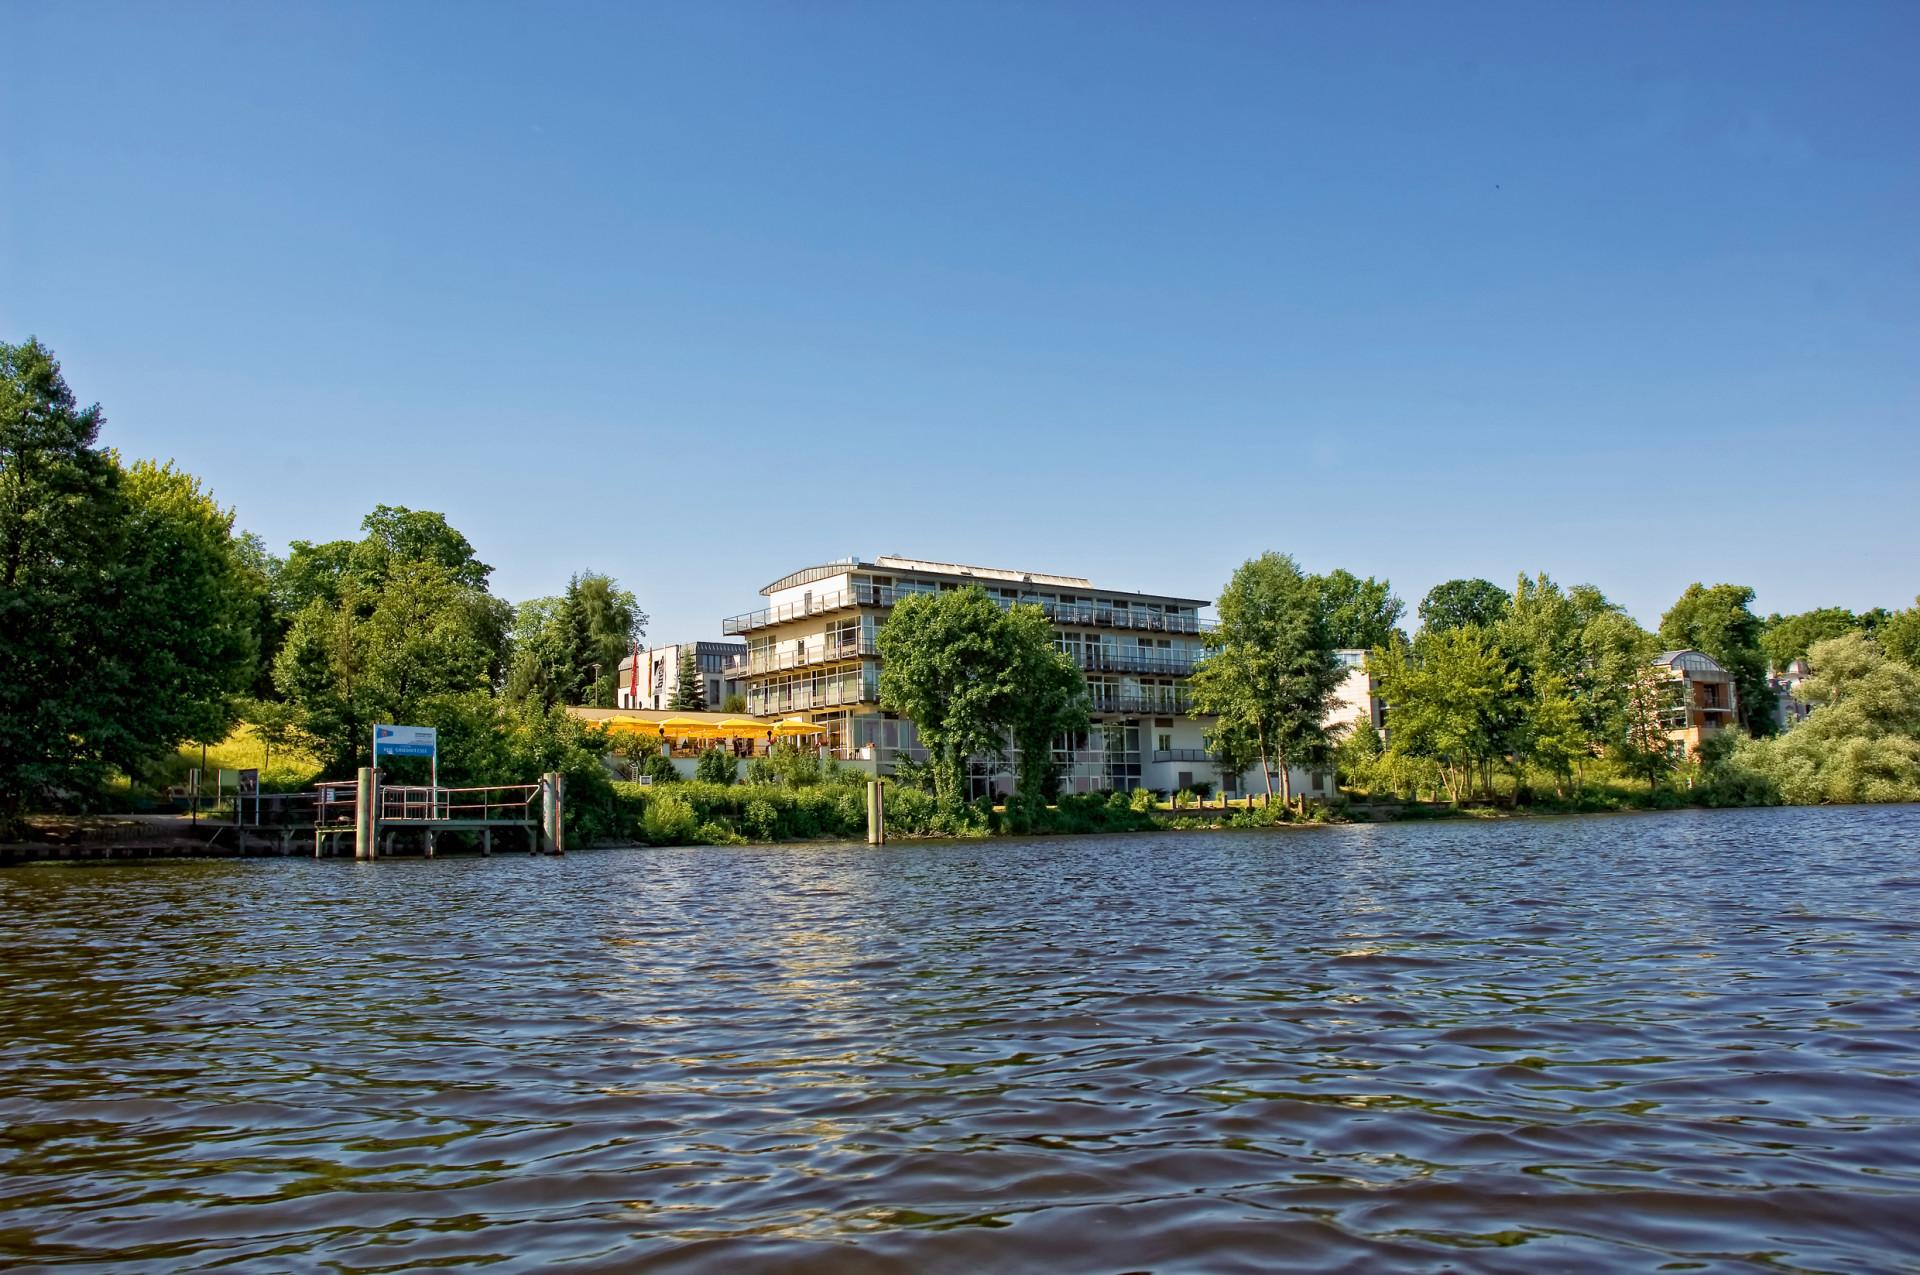 Hotel am Griebnitzsee